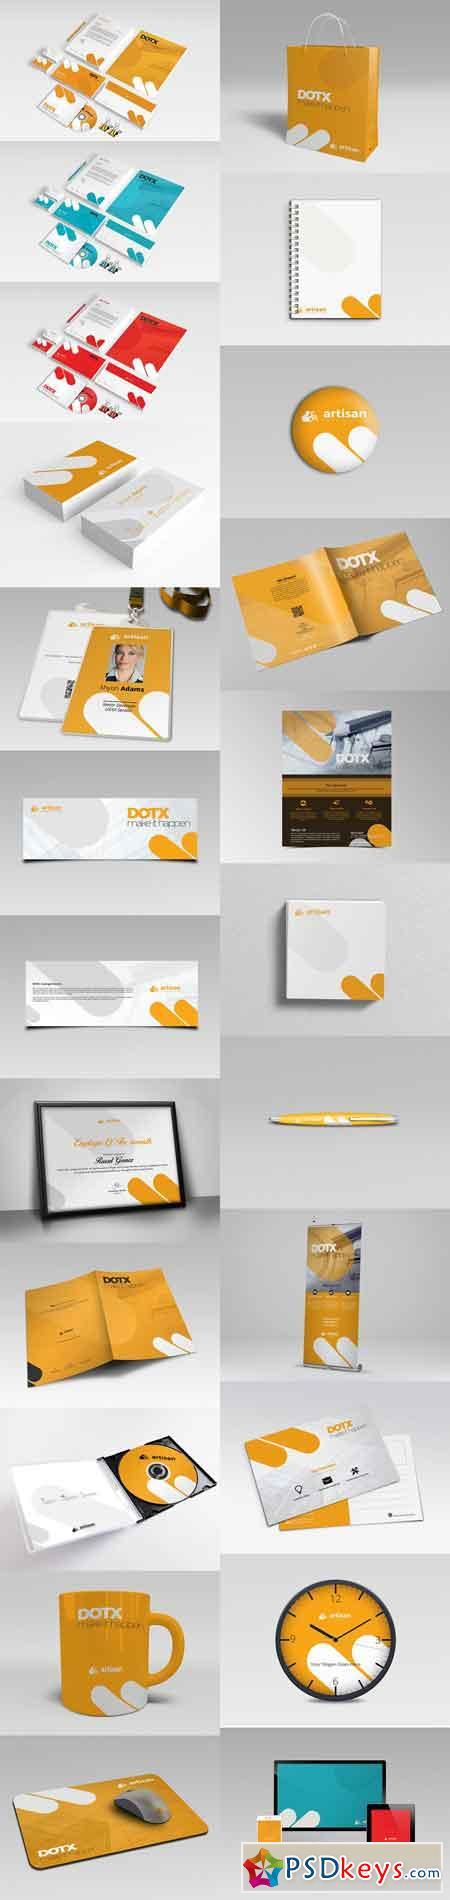 Branding Identity 2303559